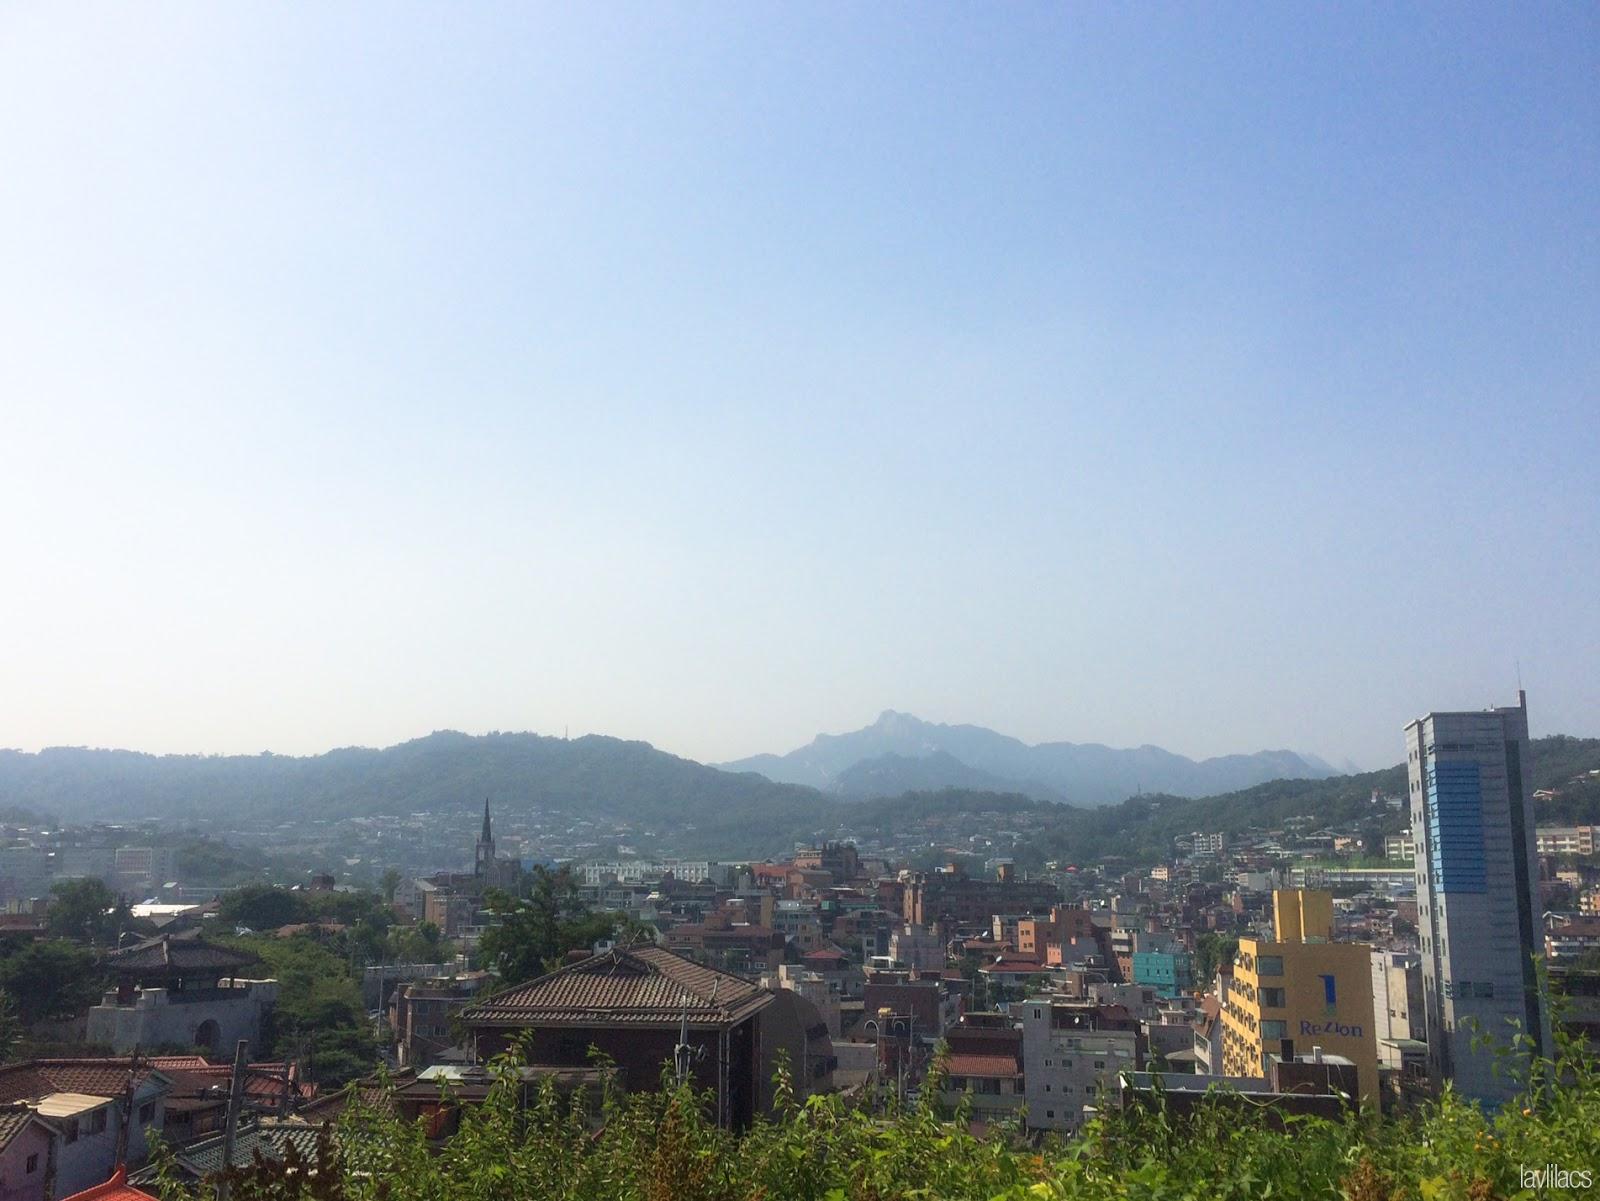 Seoul, Korea - Summer Study Abroad 2014 - Seoul Fortress Trail - Naksan Trail Course - View